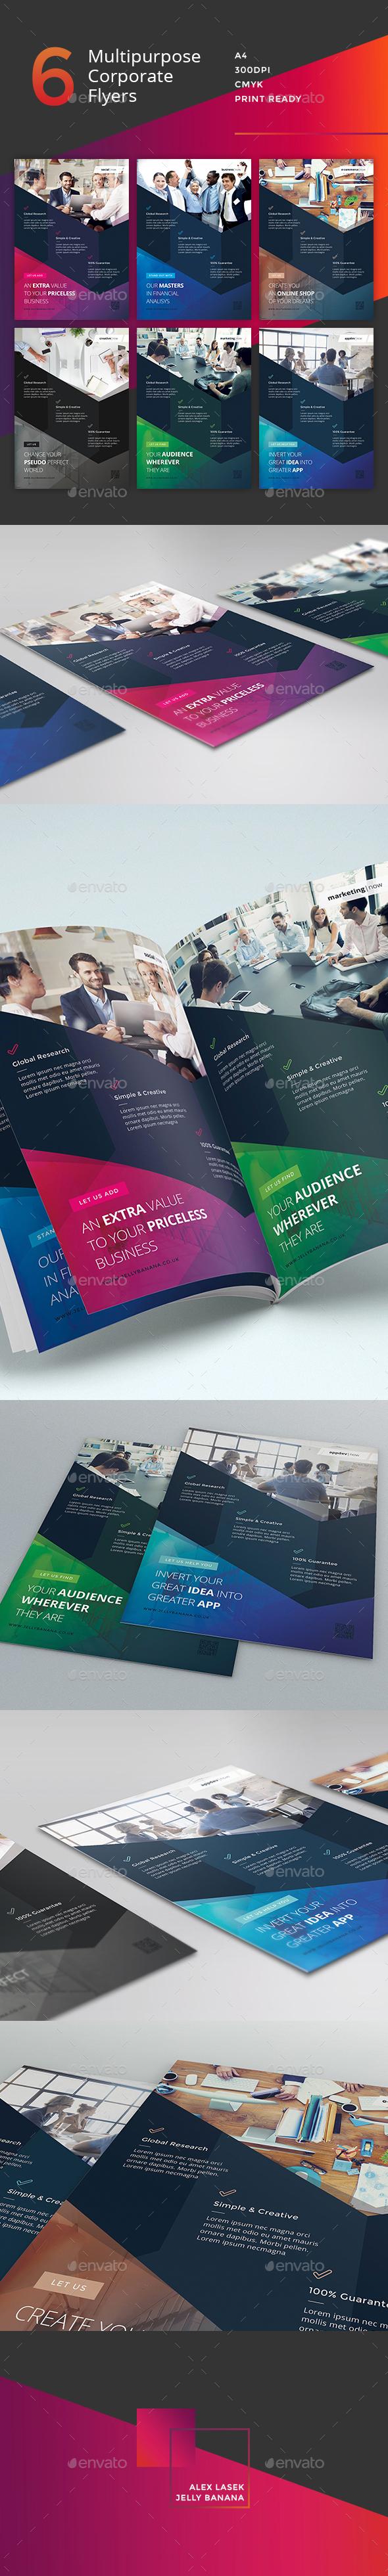 Corporate Flyer - 6 Multipurpose Business Templates vol 26 - Corporate Flyers